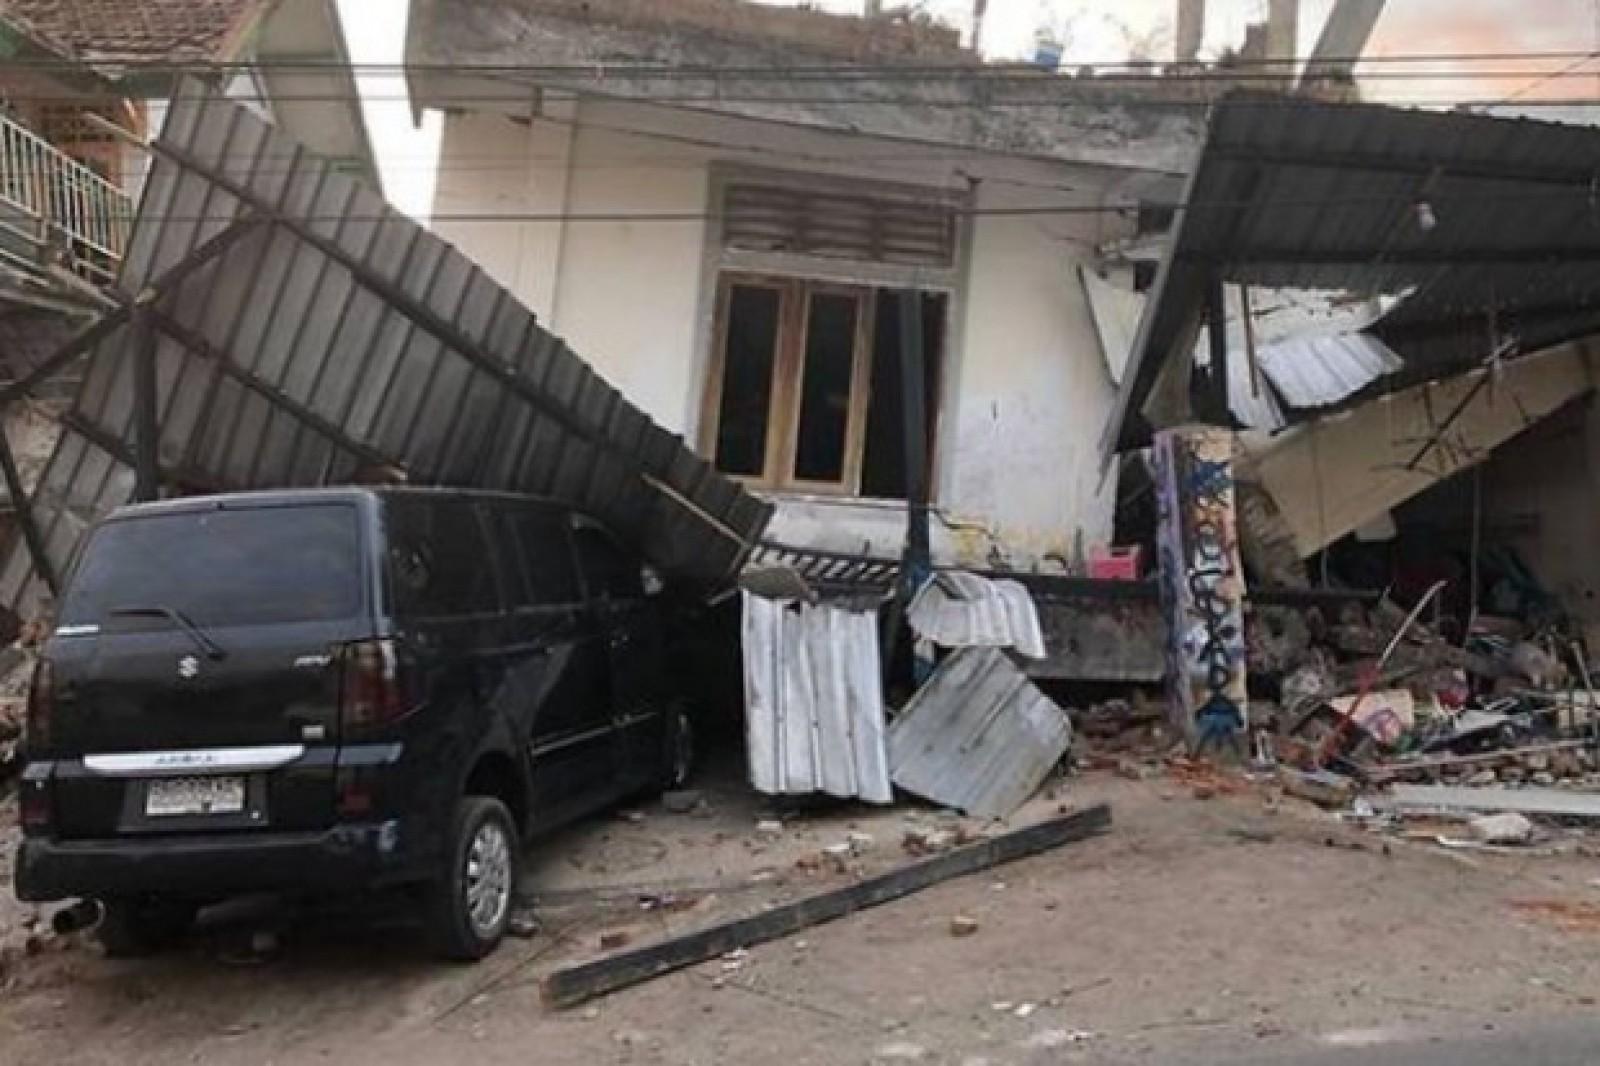 Un nou cutremur puternic a lovit insula Lombok din Indonezia